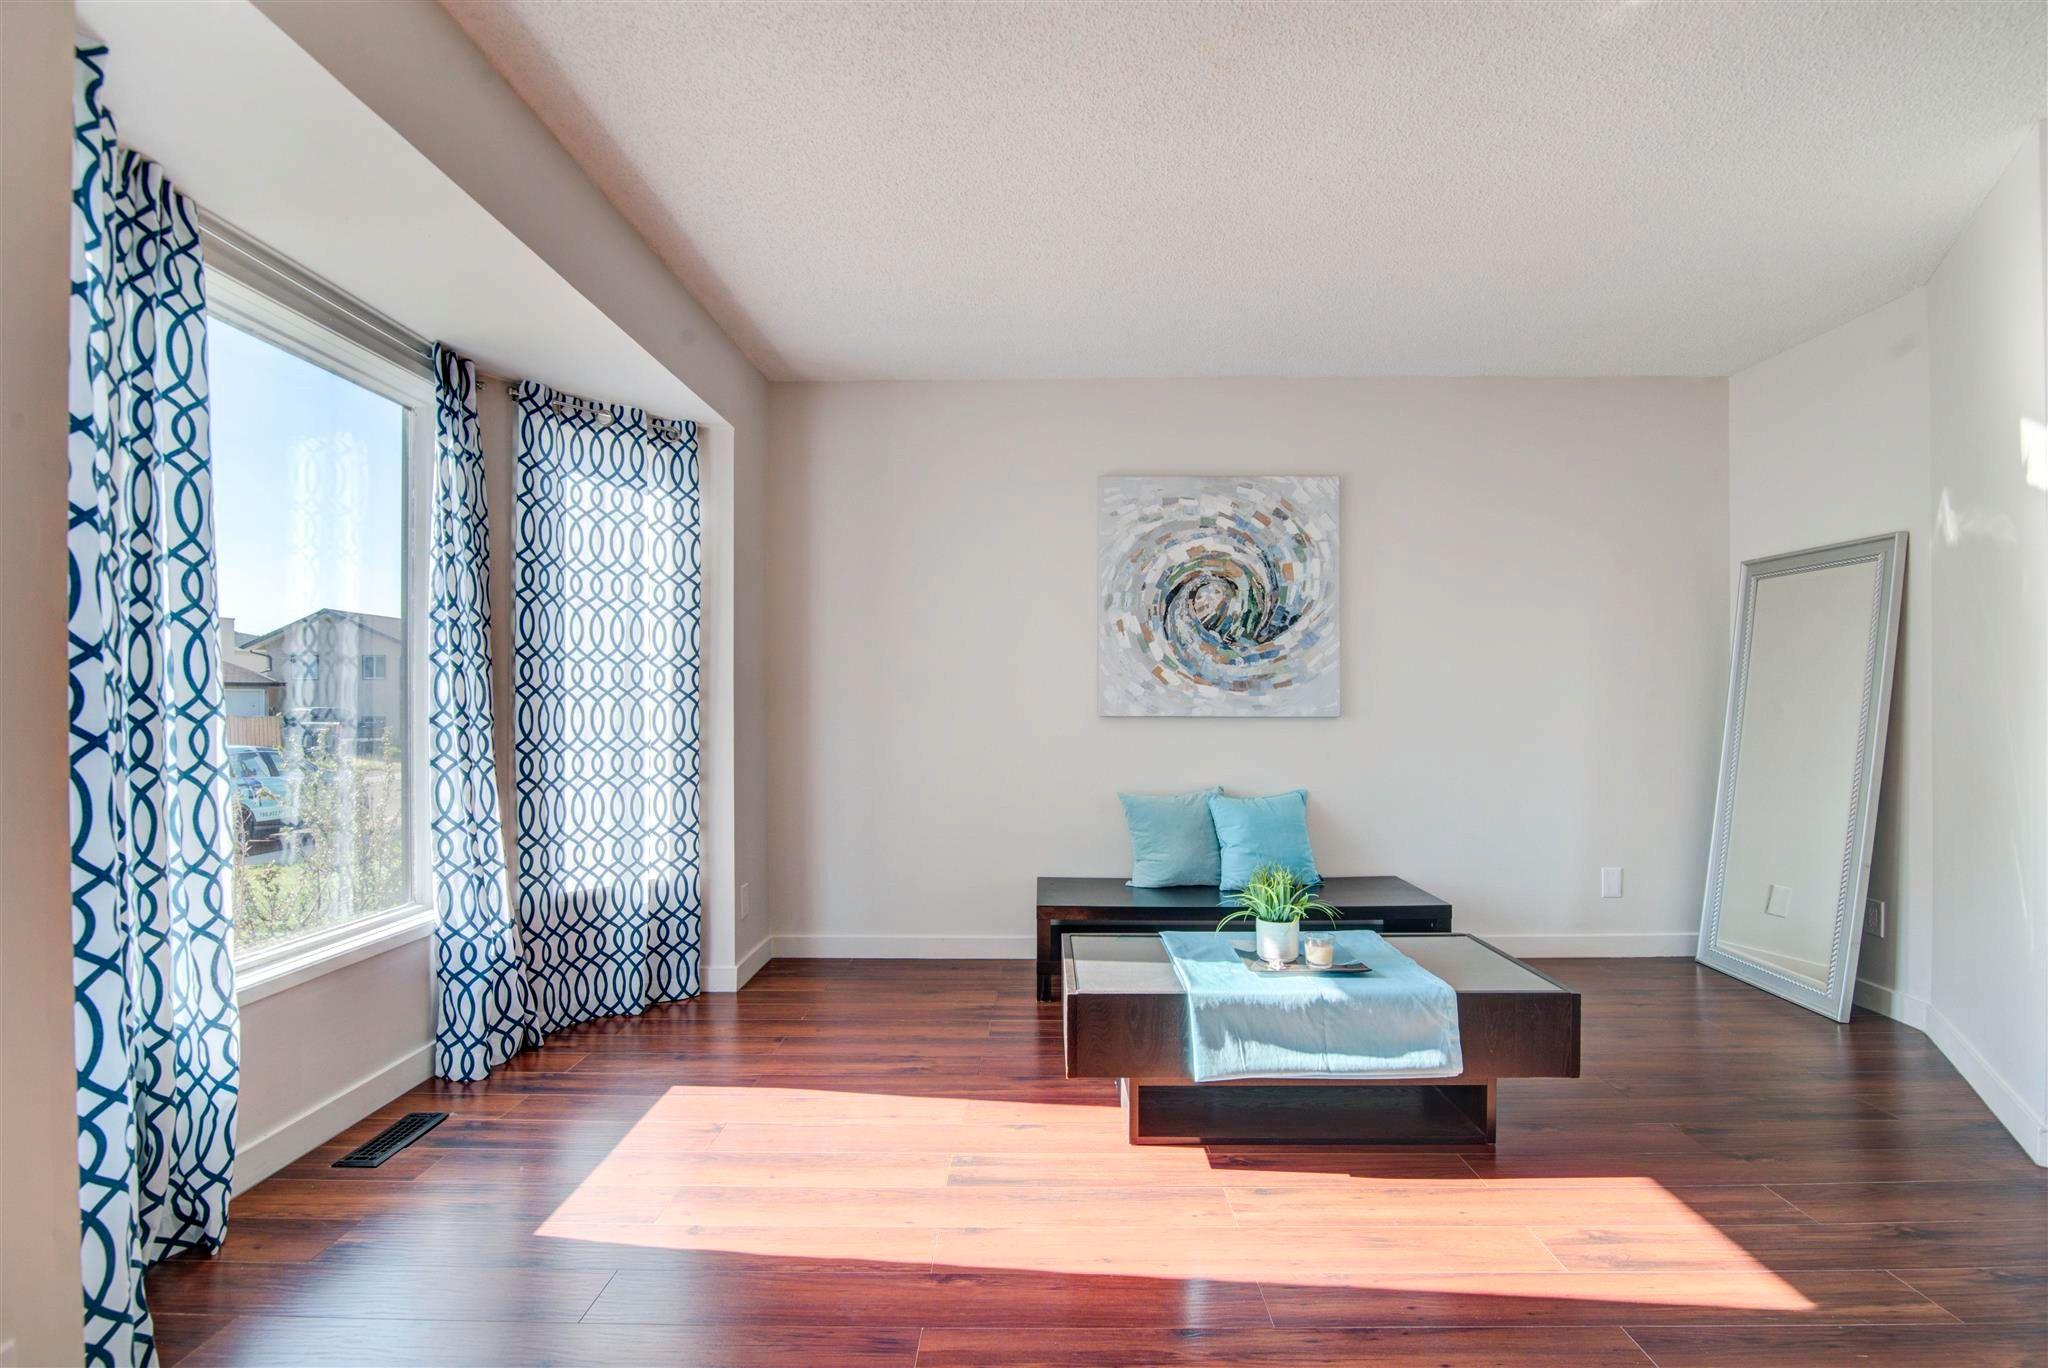 Main Photo: 4128 37 Street in Edmonton: Zone 29 House for sale : MLS®# E4253899